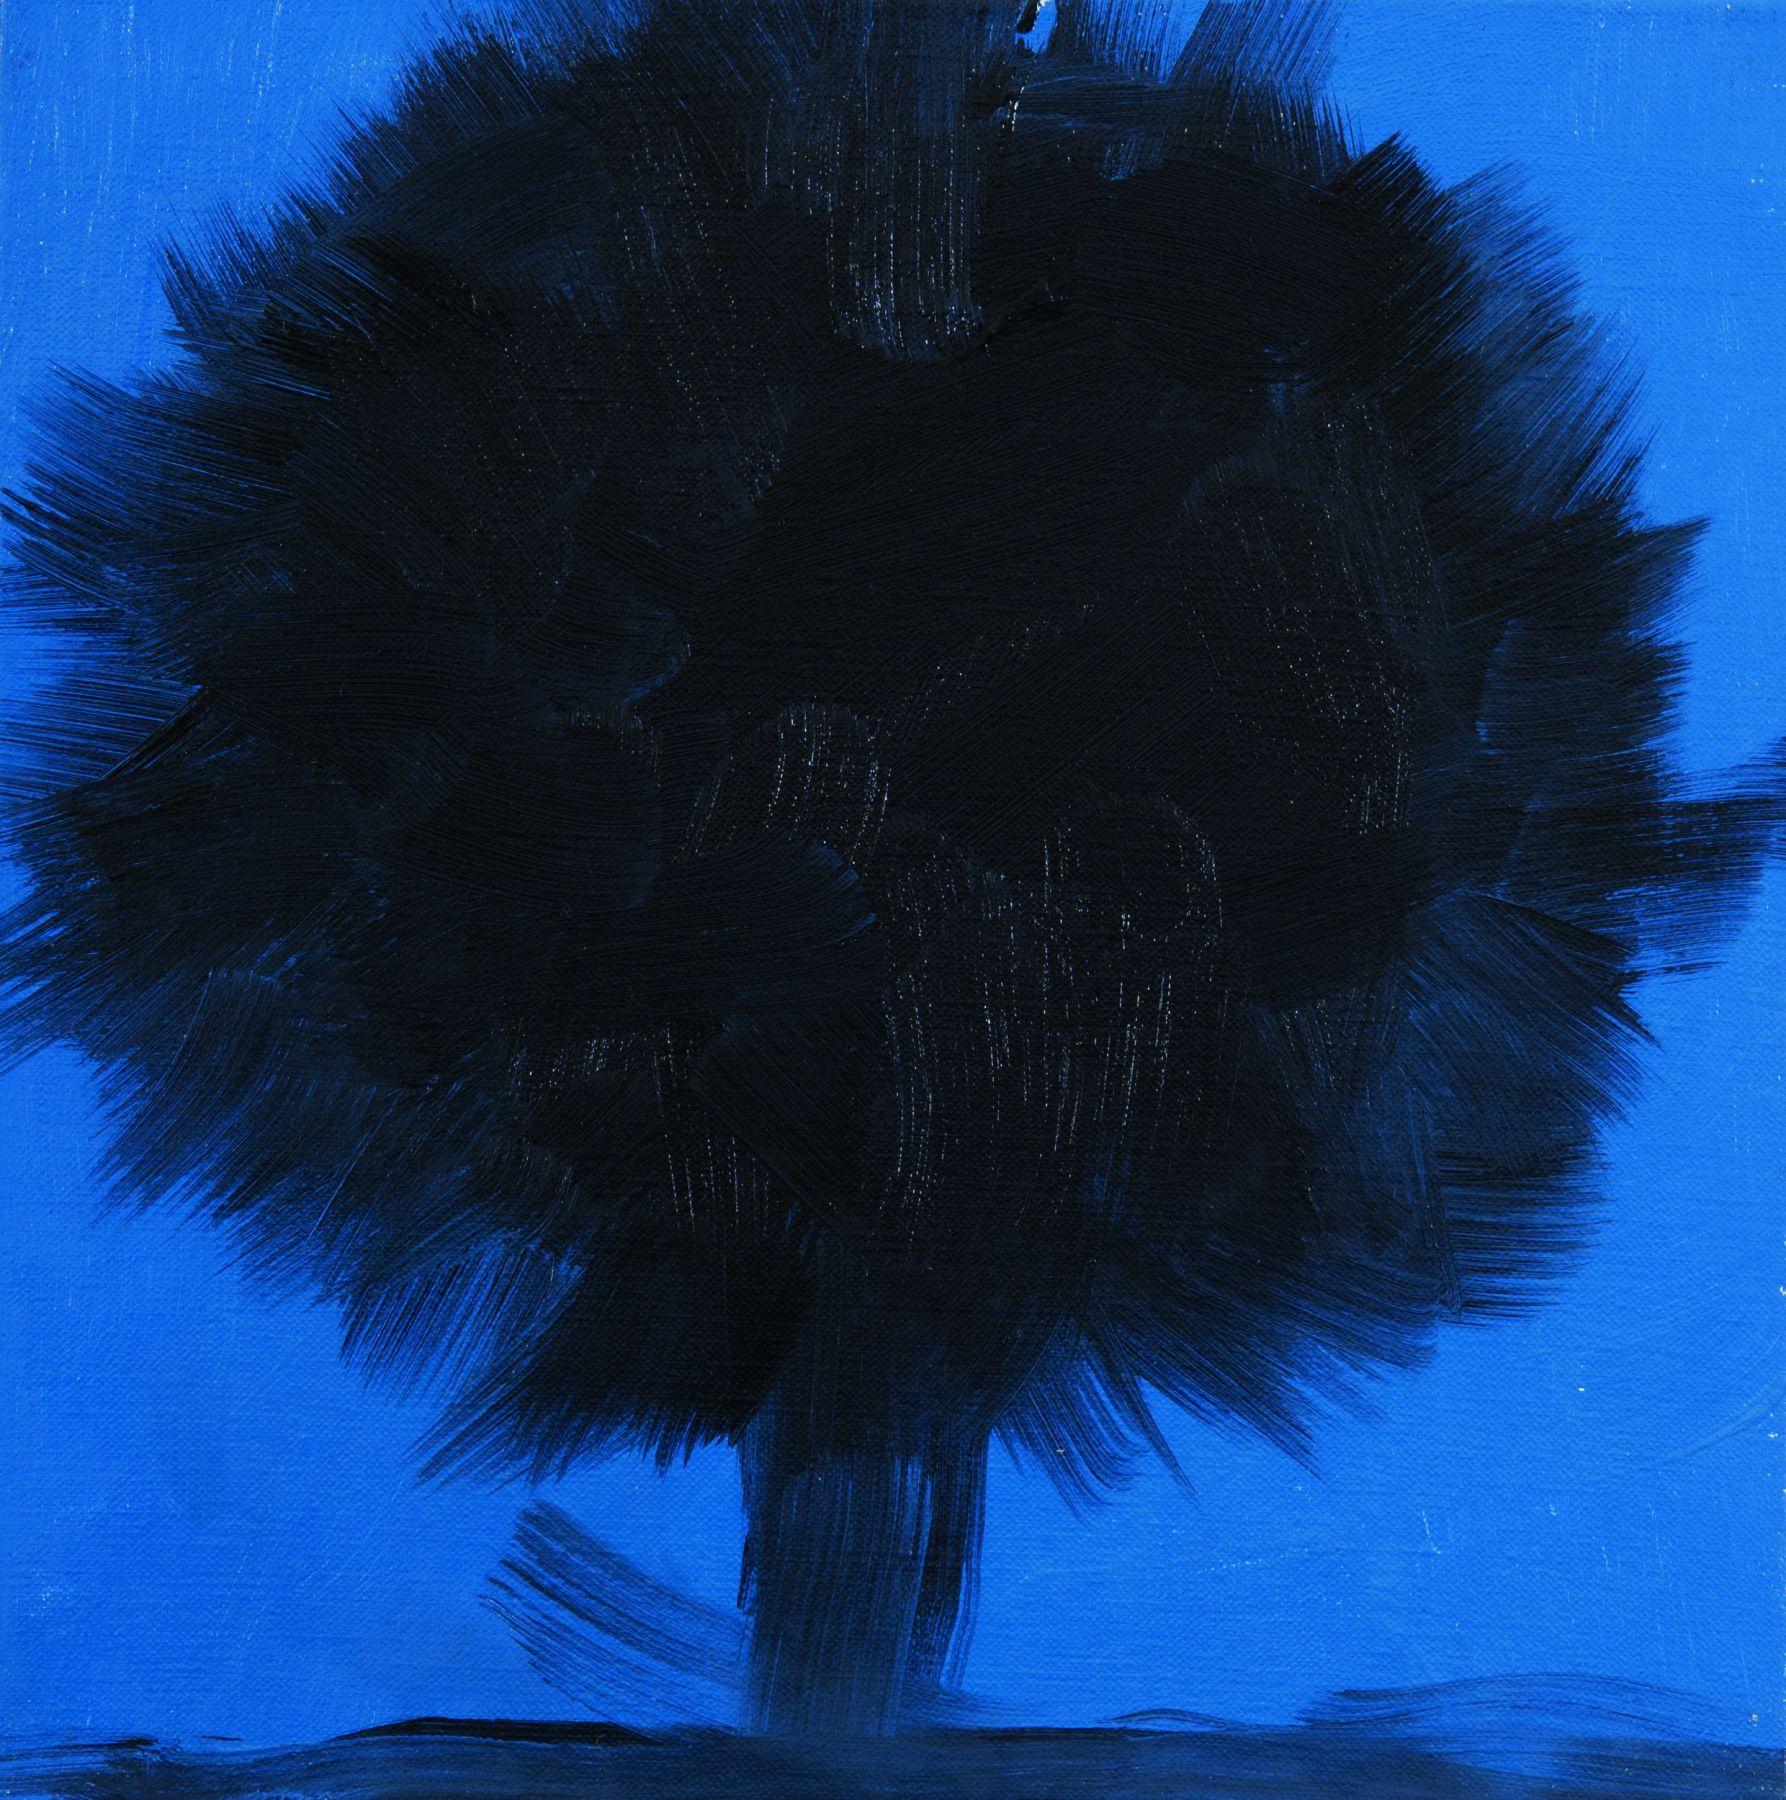 ANN CRAVEN, Tree (Purple Beech, Cushing 8.11.12, 9:30PM),2012